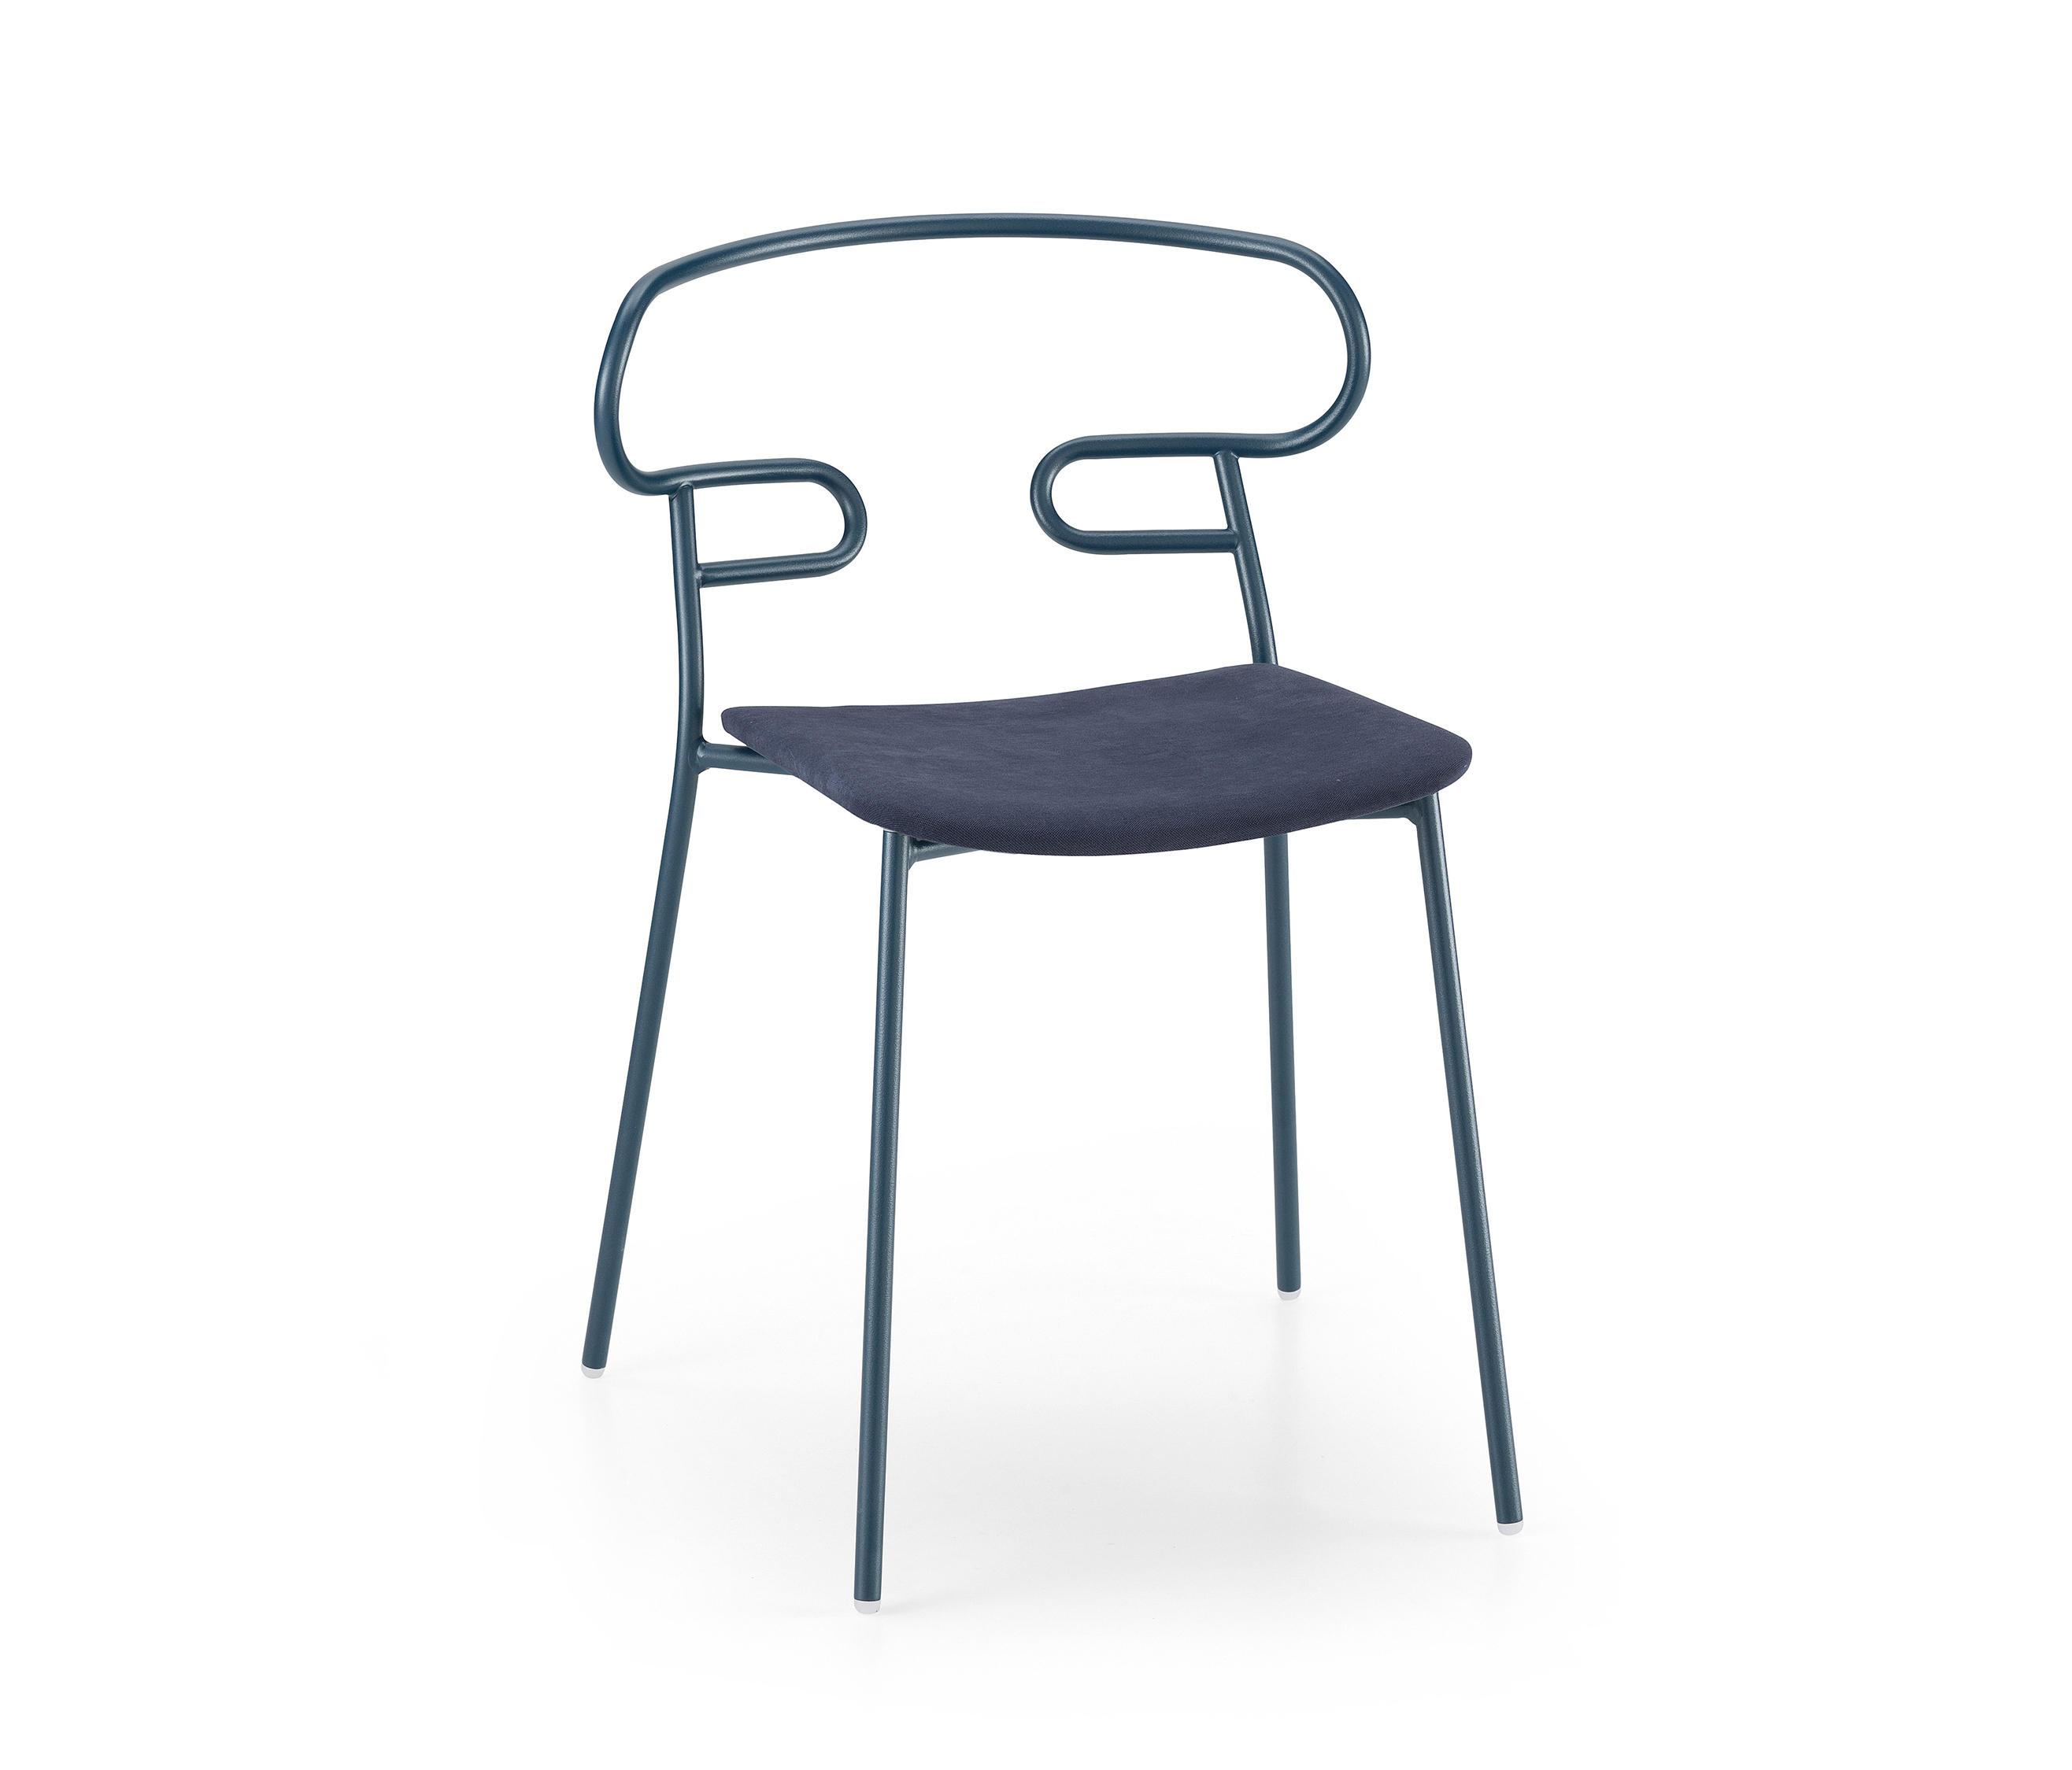 Genoa Chair by Cesare Ehr for Trabà